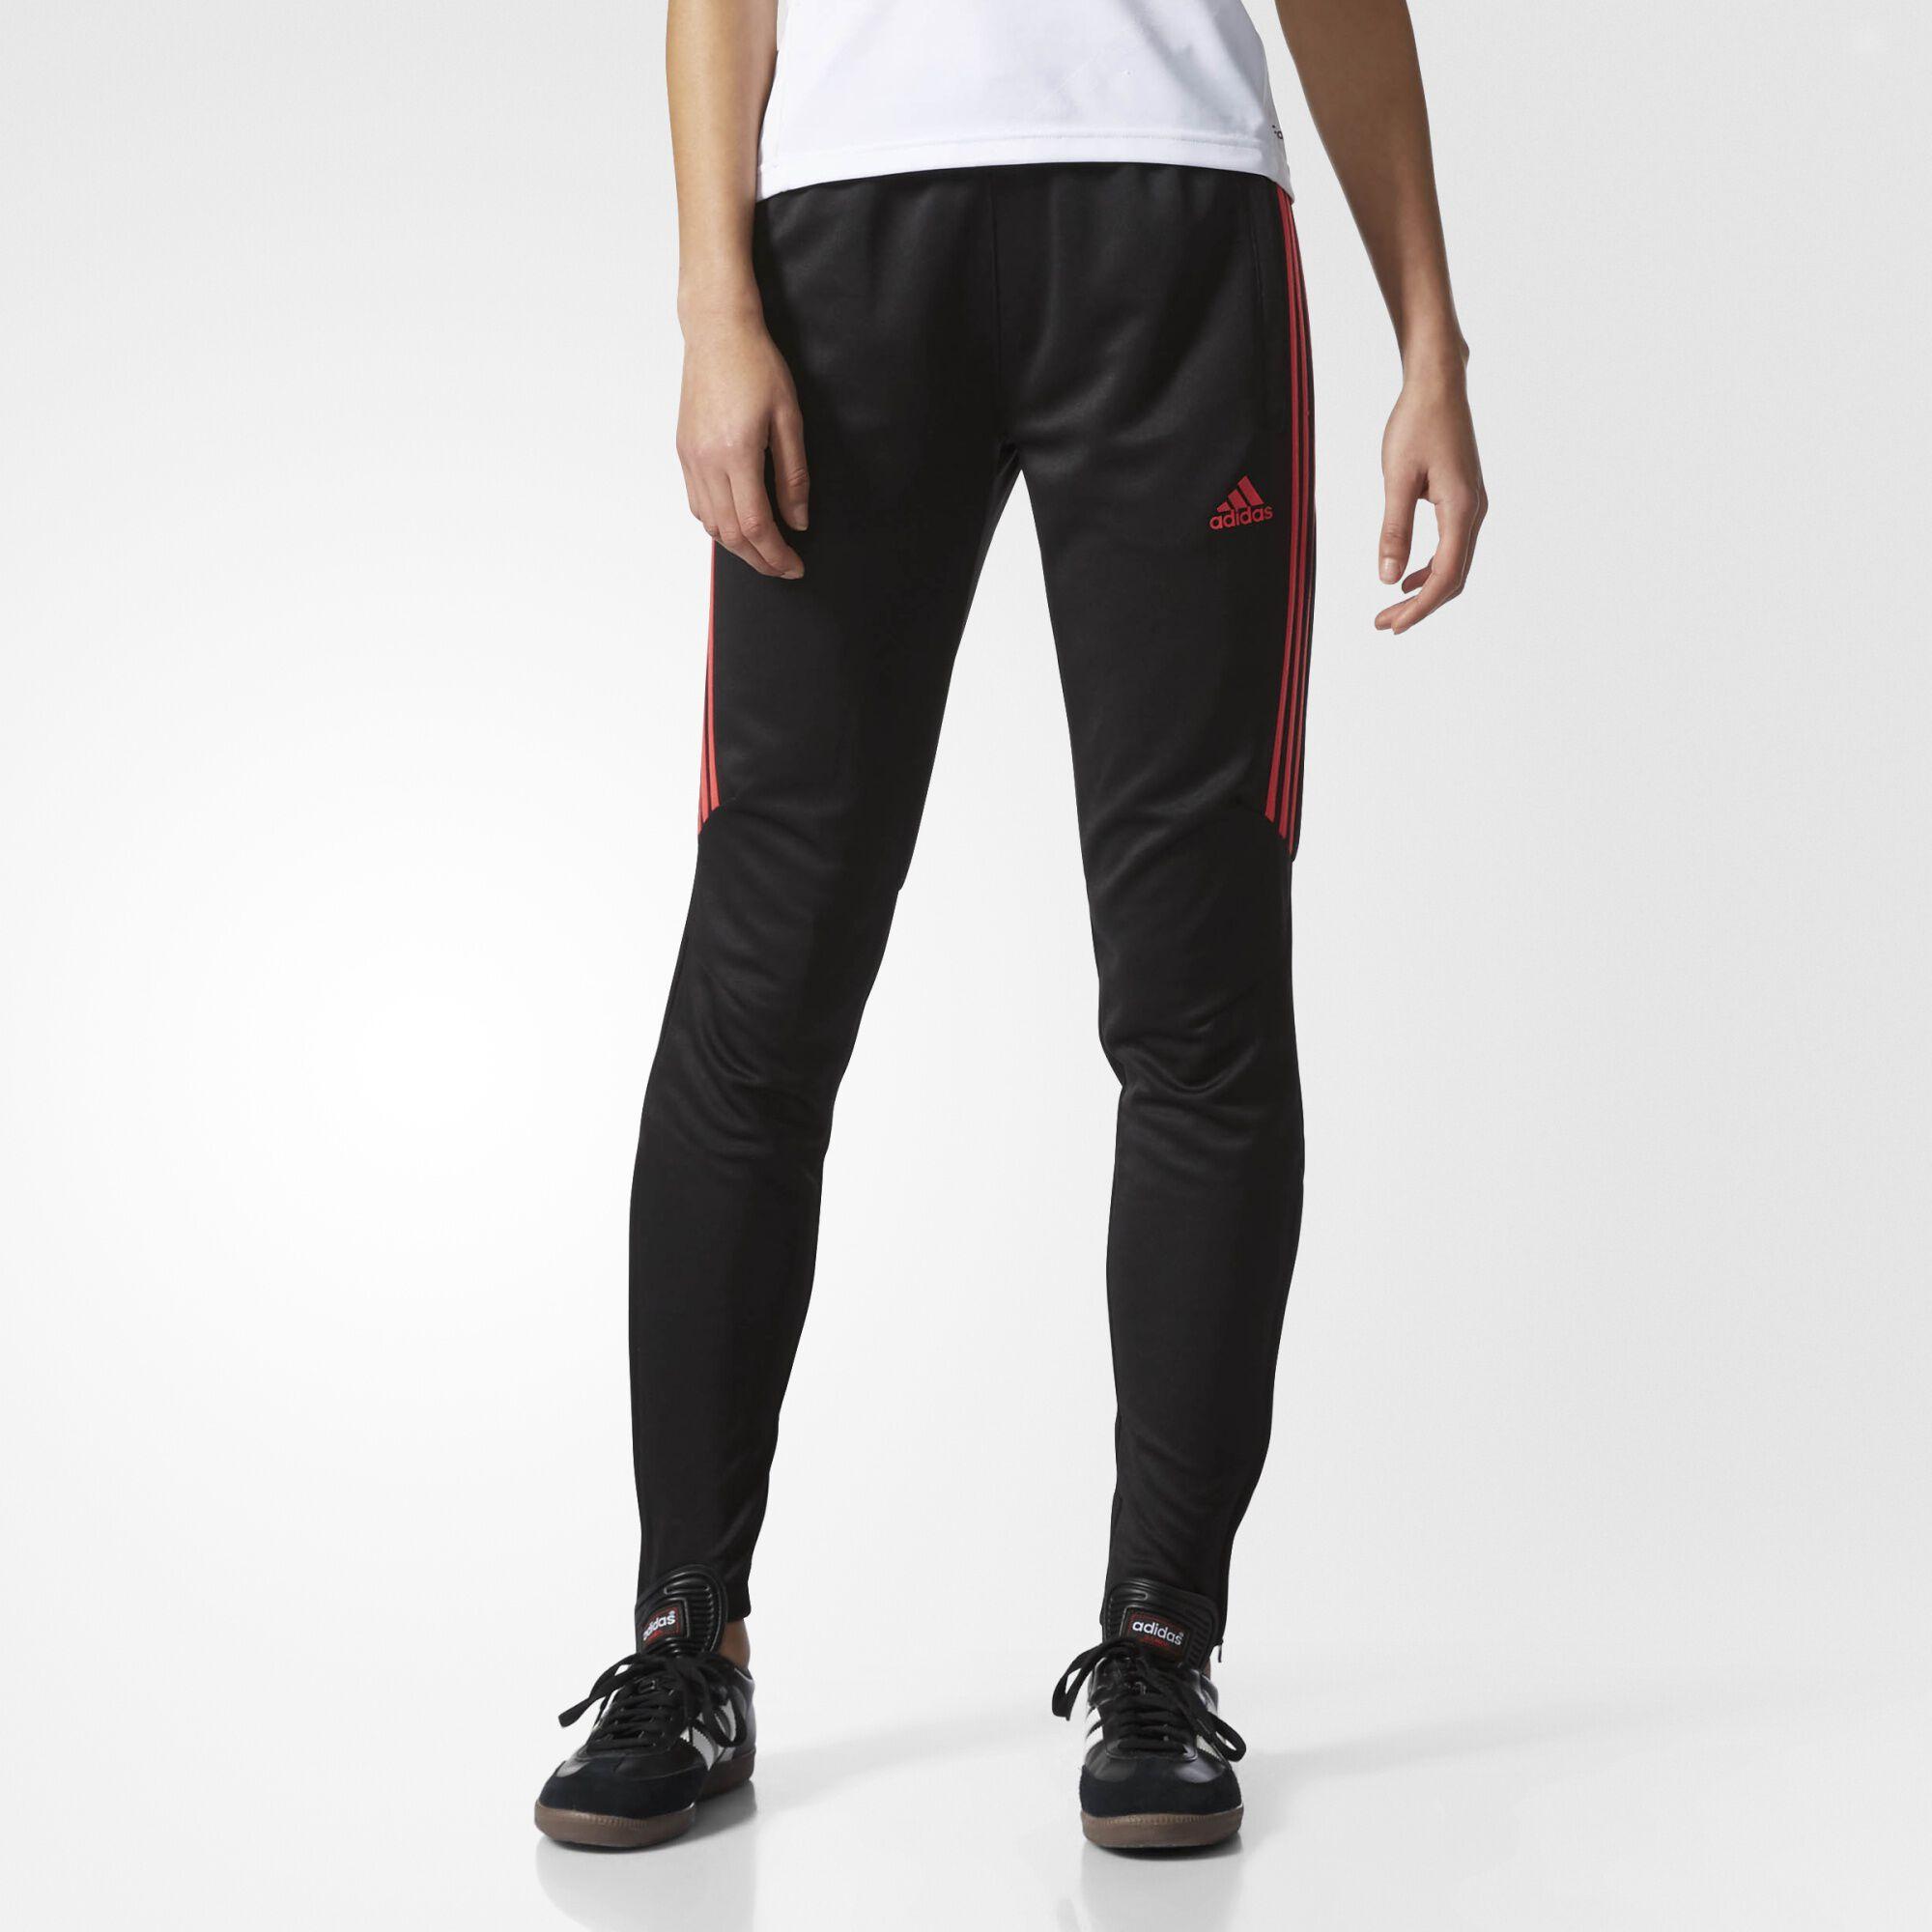 adidas skinny jogging pants